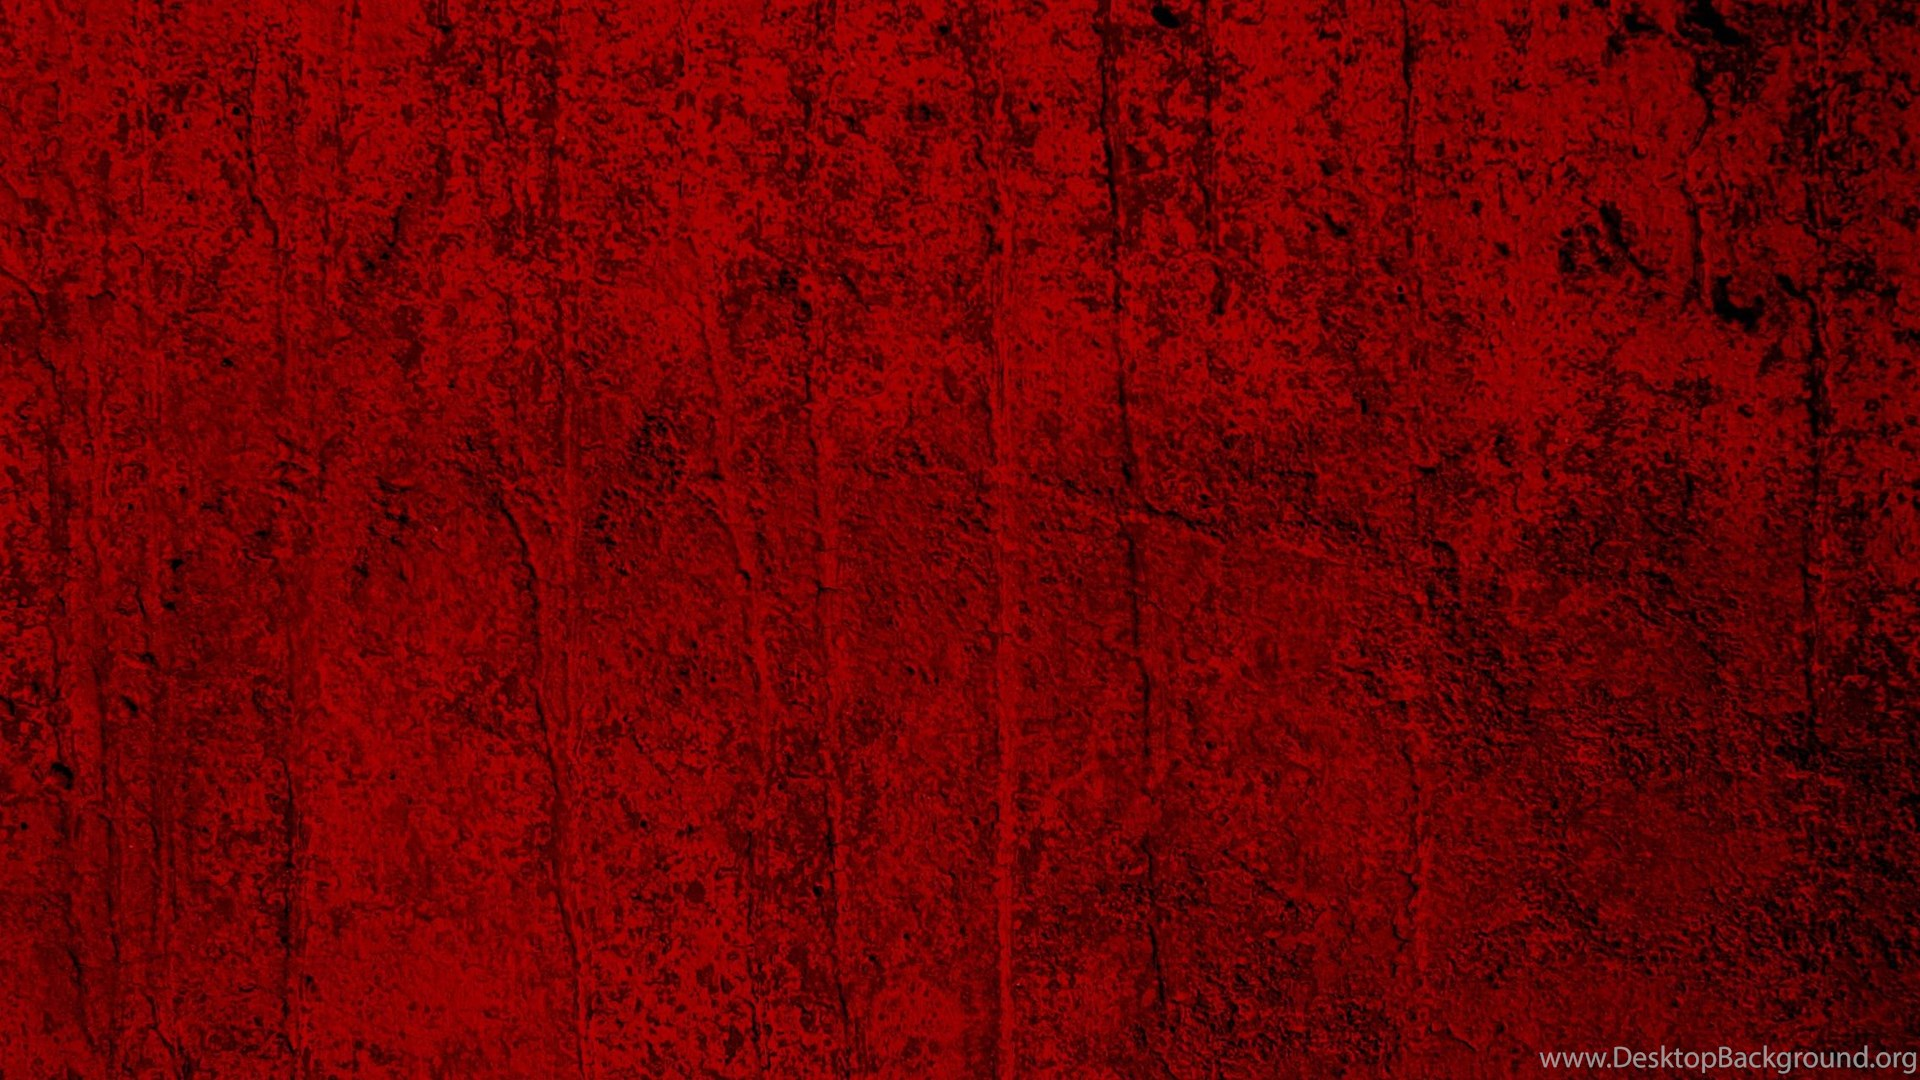 Textured Red Wallpapers Wallpapers Cave Desktop Background